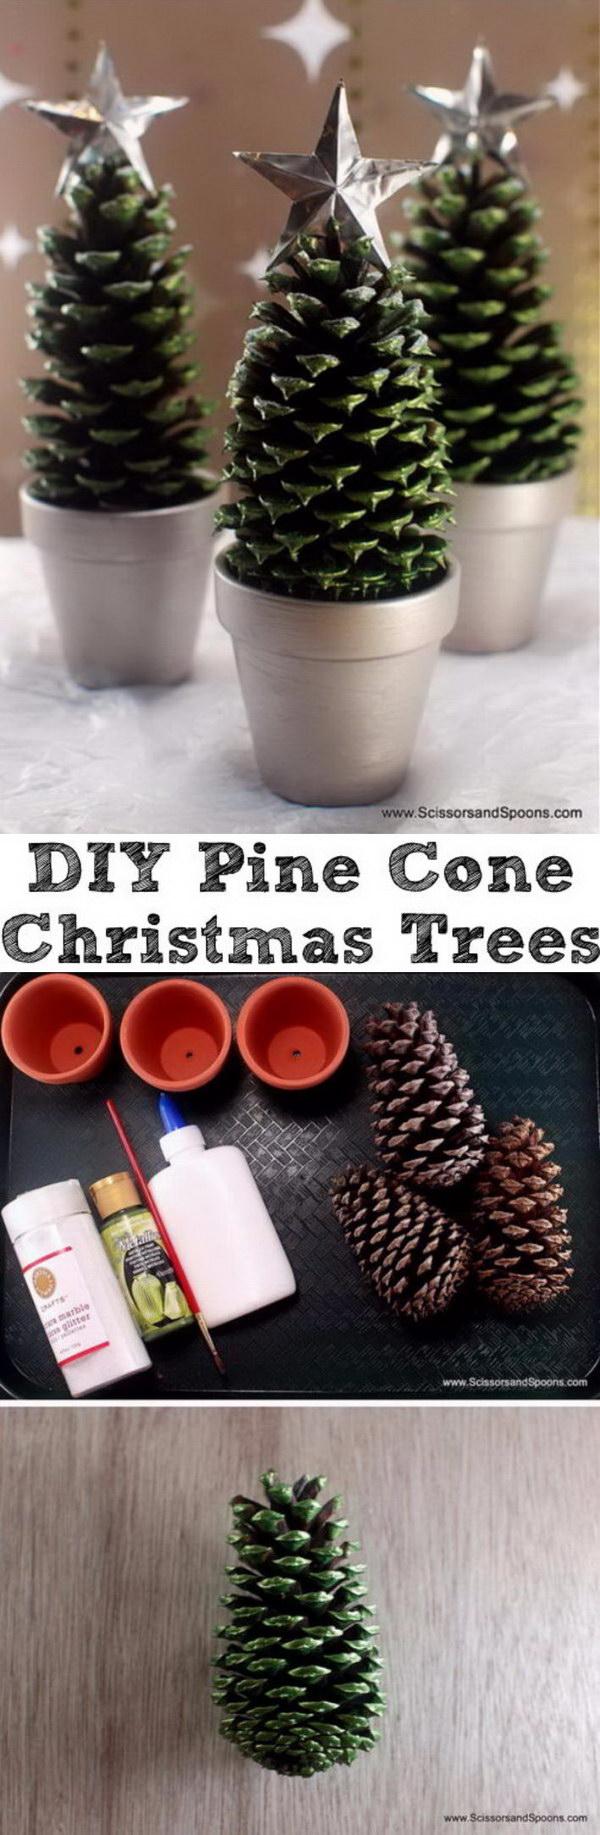 Pine Cone Christmas Trees.